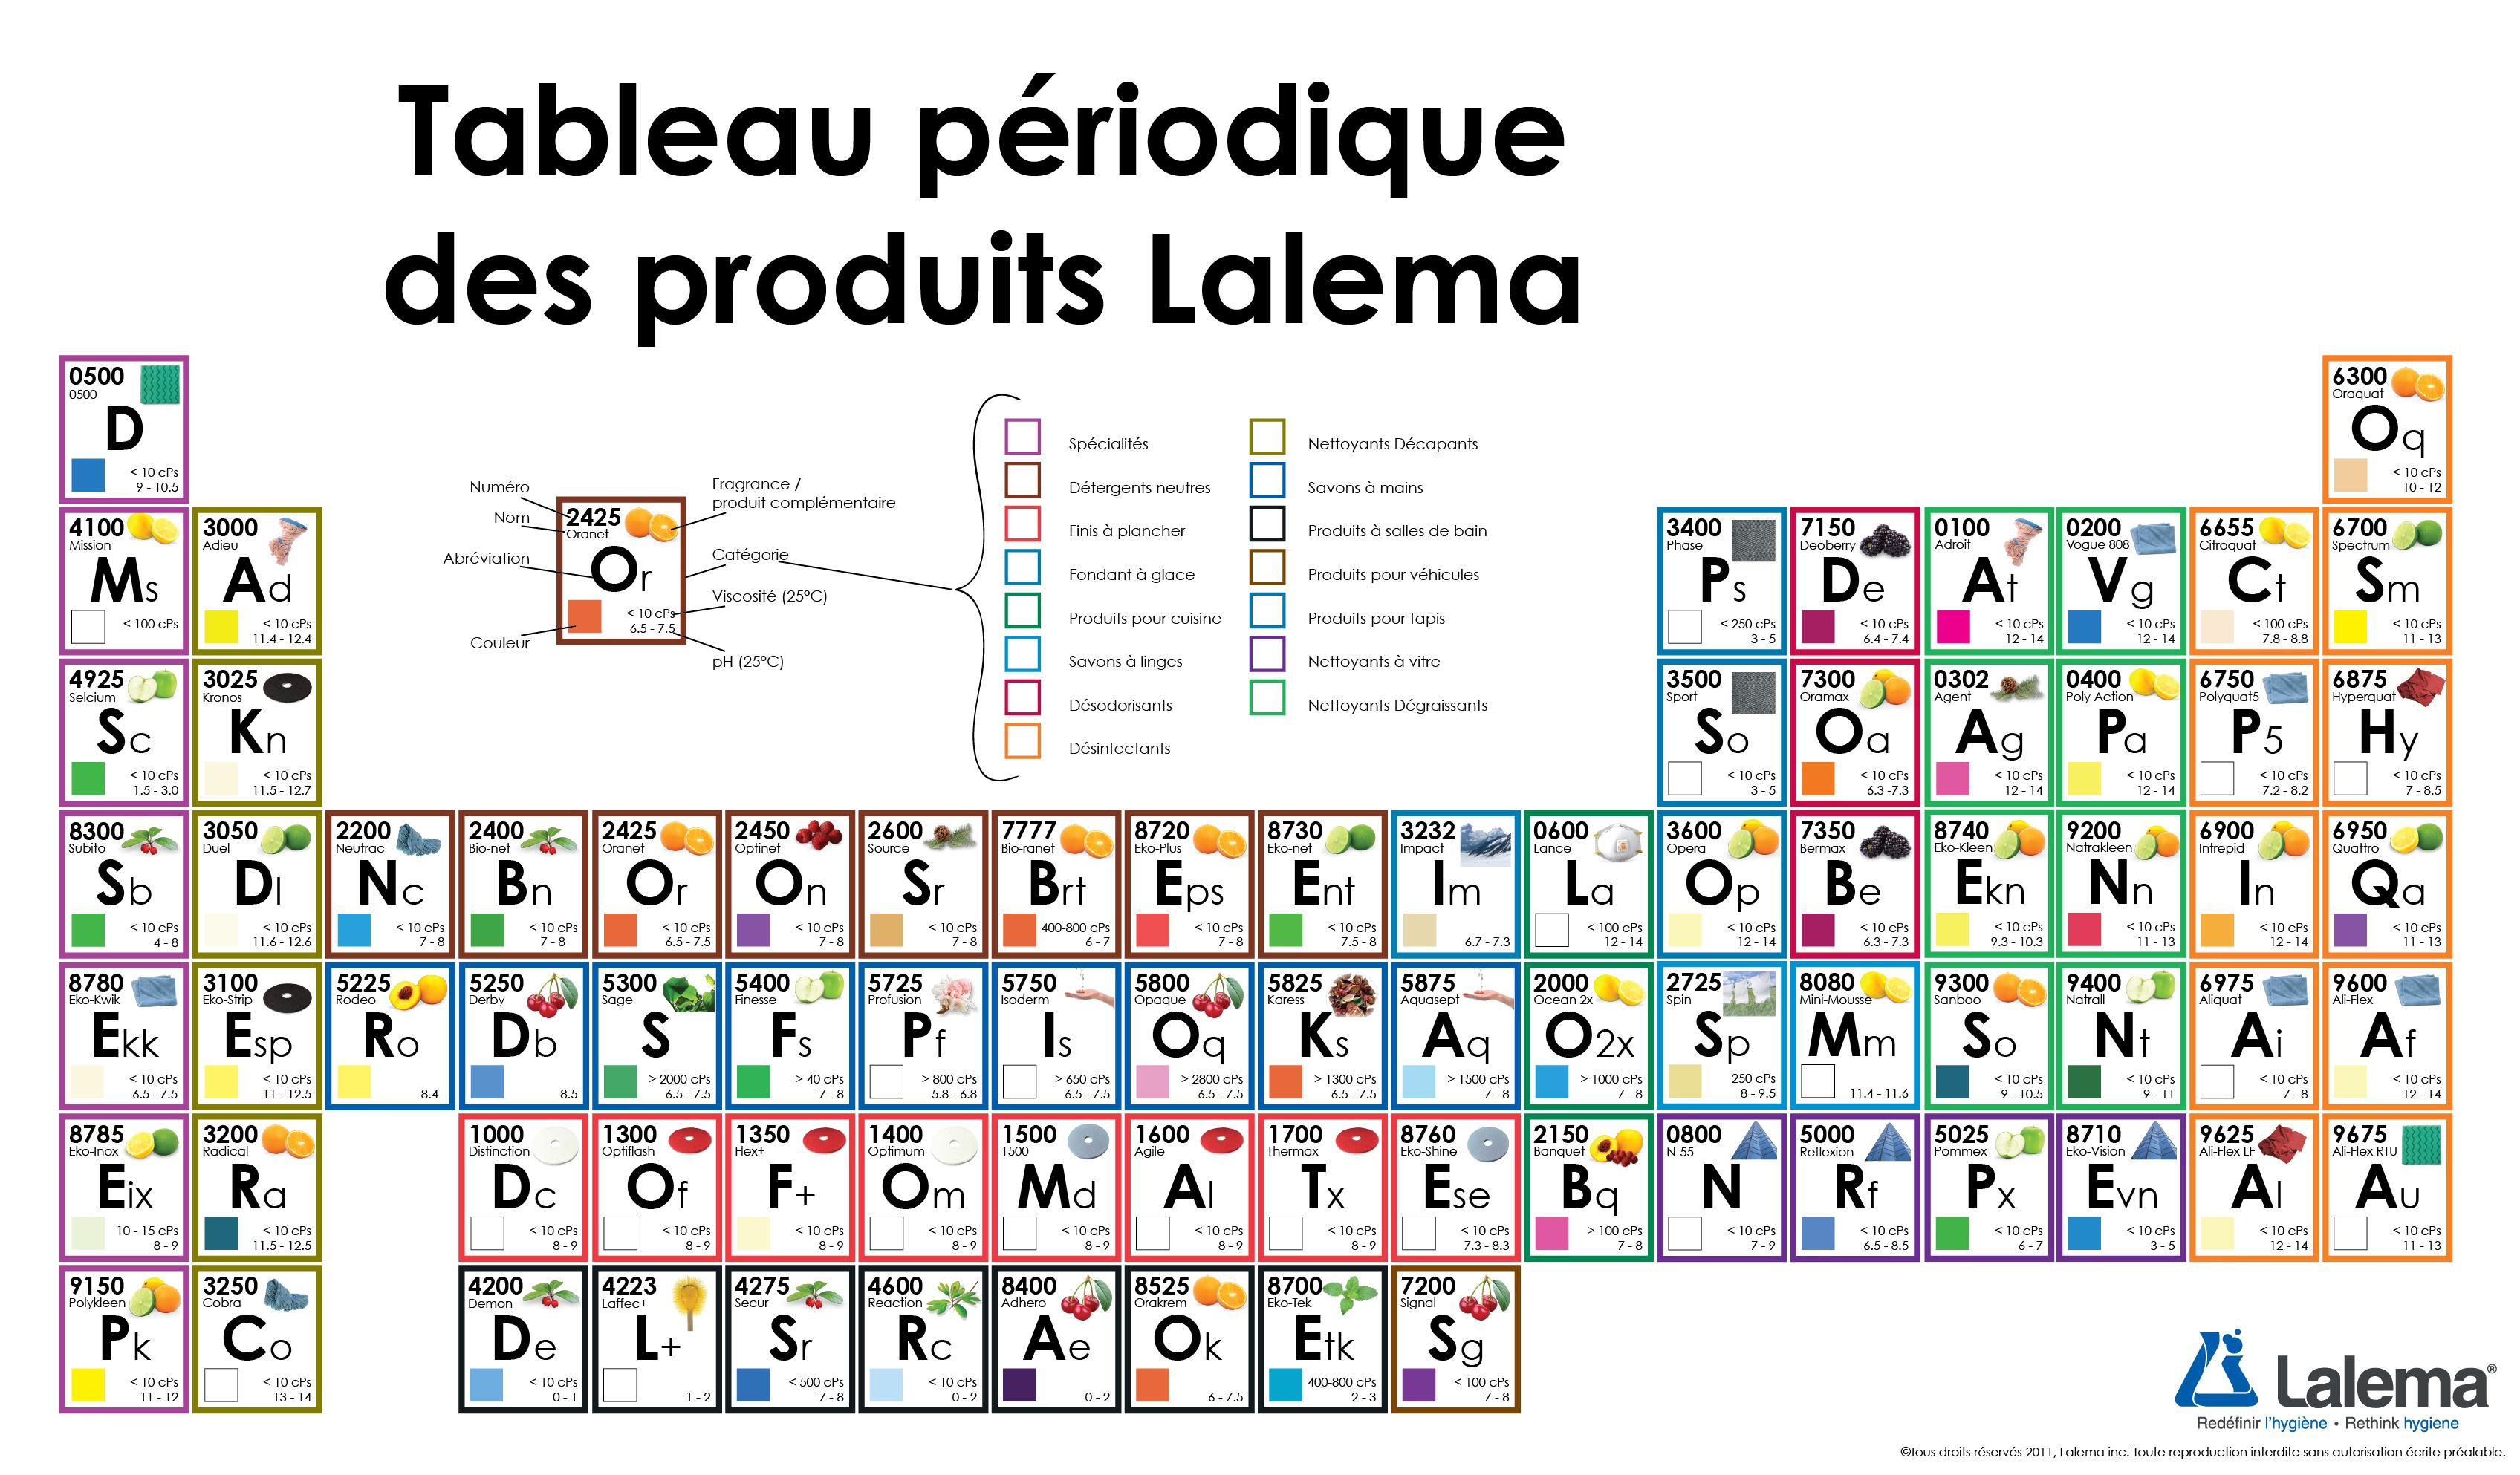 Tableau priodique des lments lalema periodic tables taules periodic table tableau priodique des lments lalema gamestrikefo Images